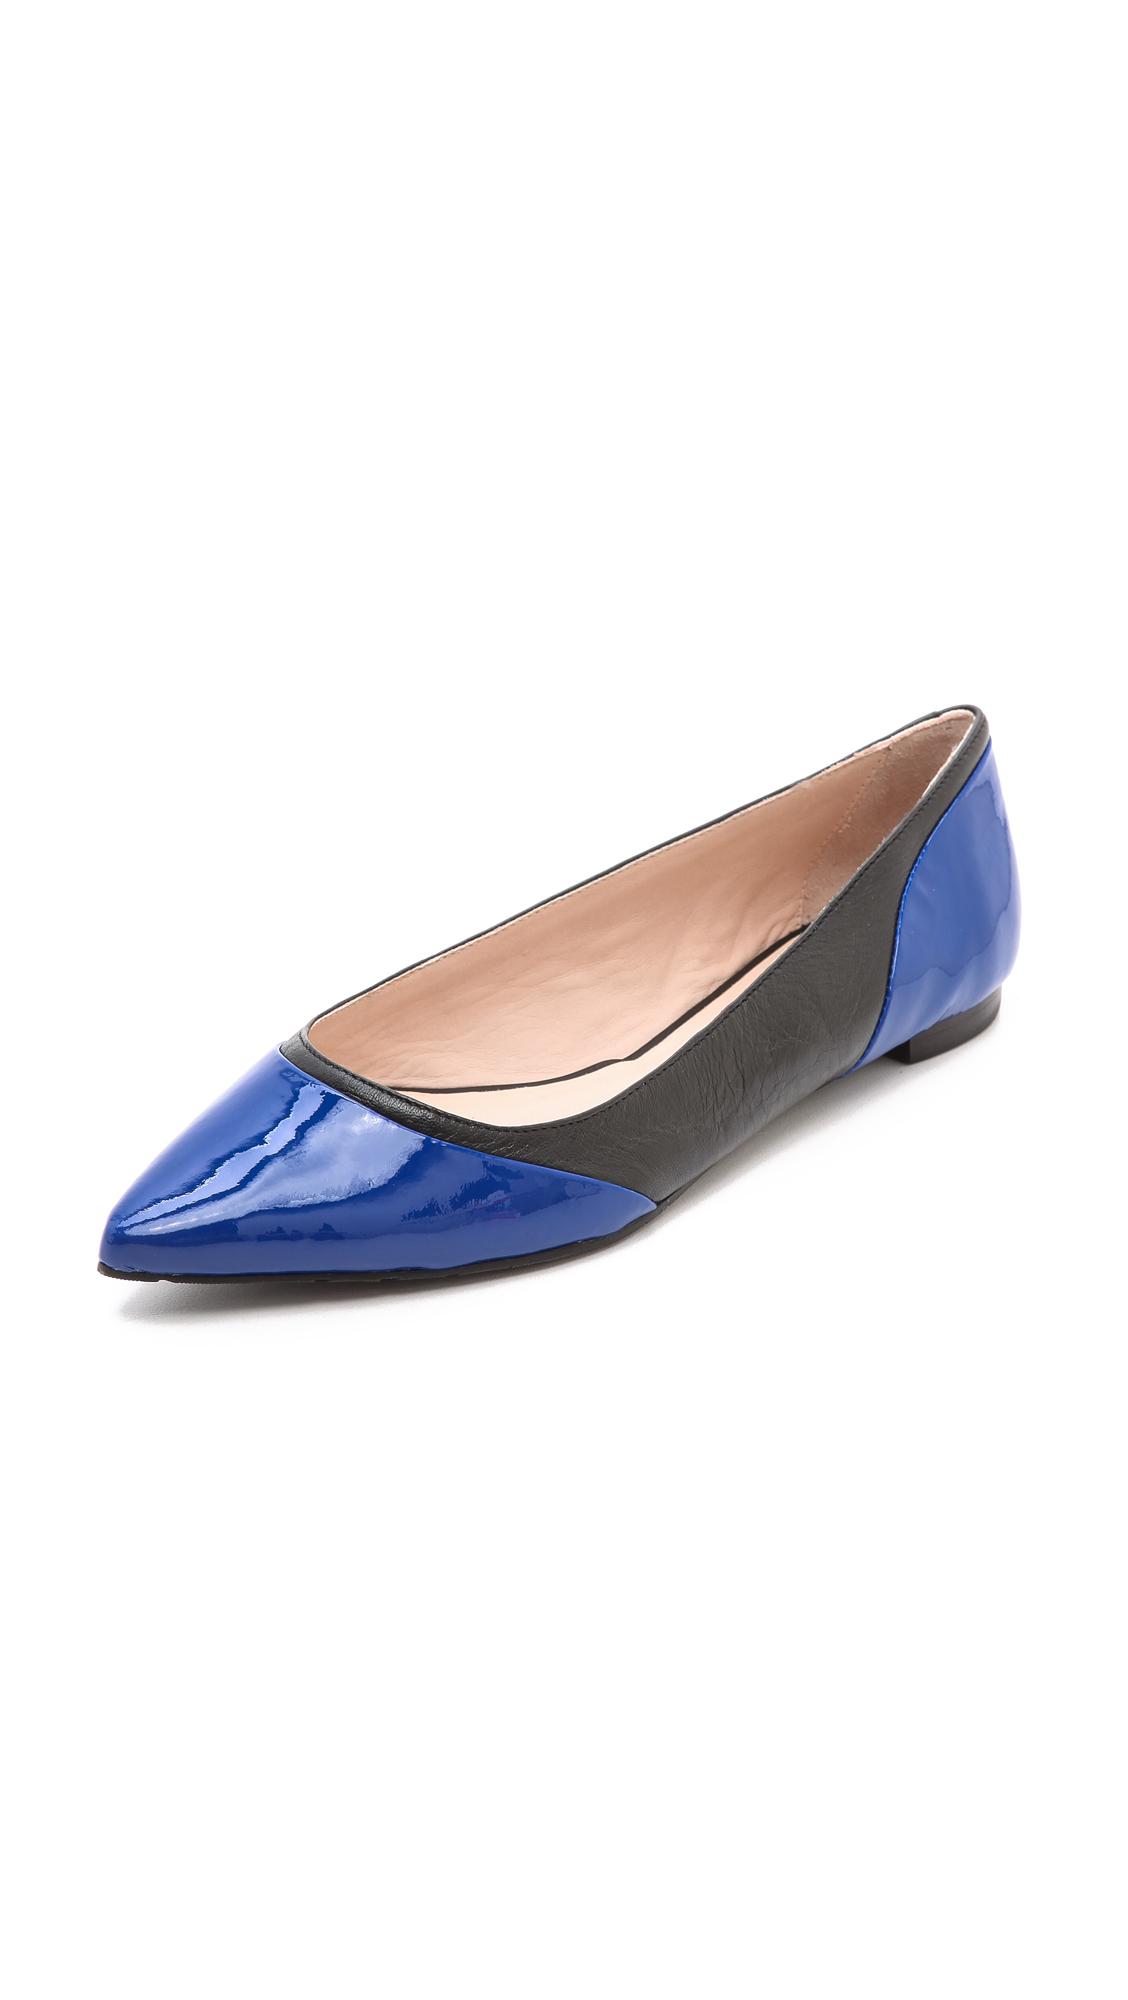 Lyst kate spade new york glinda colorblock flats in blue for Kate spade new york flats